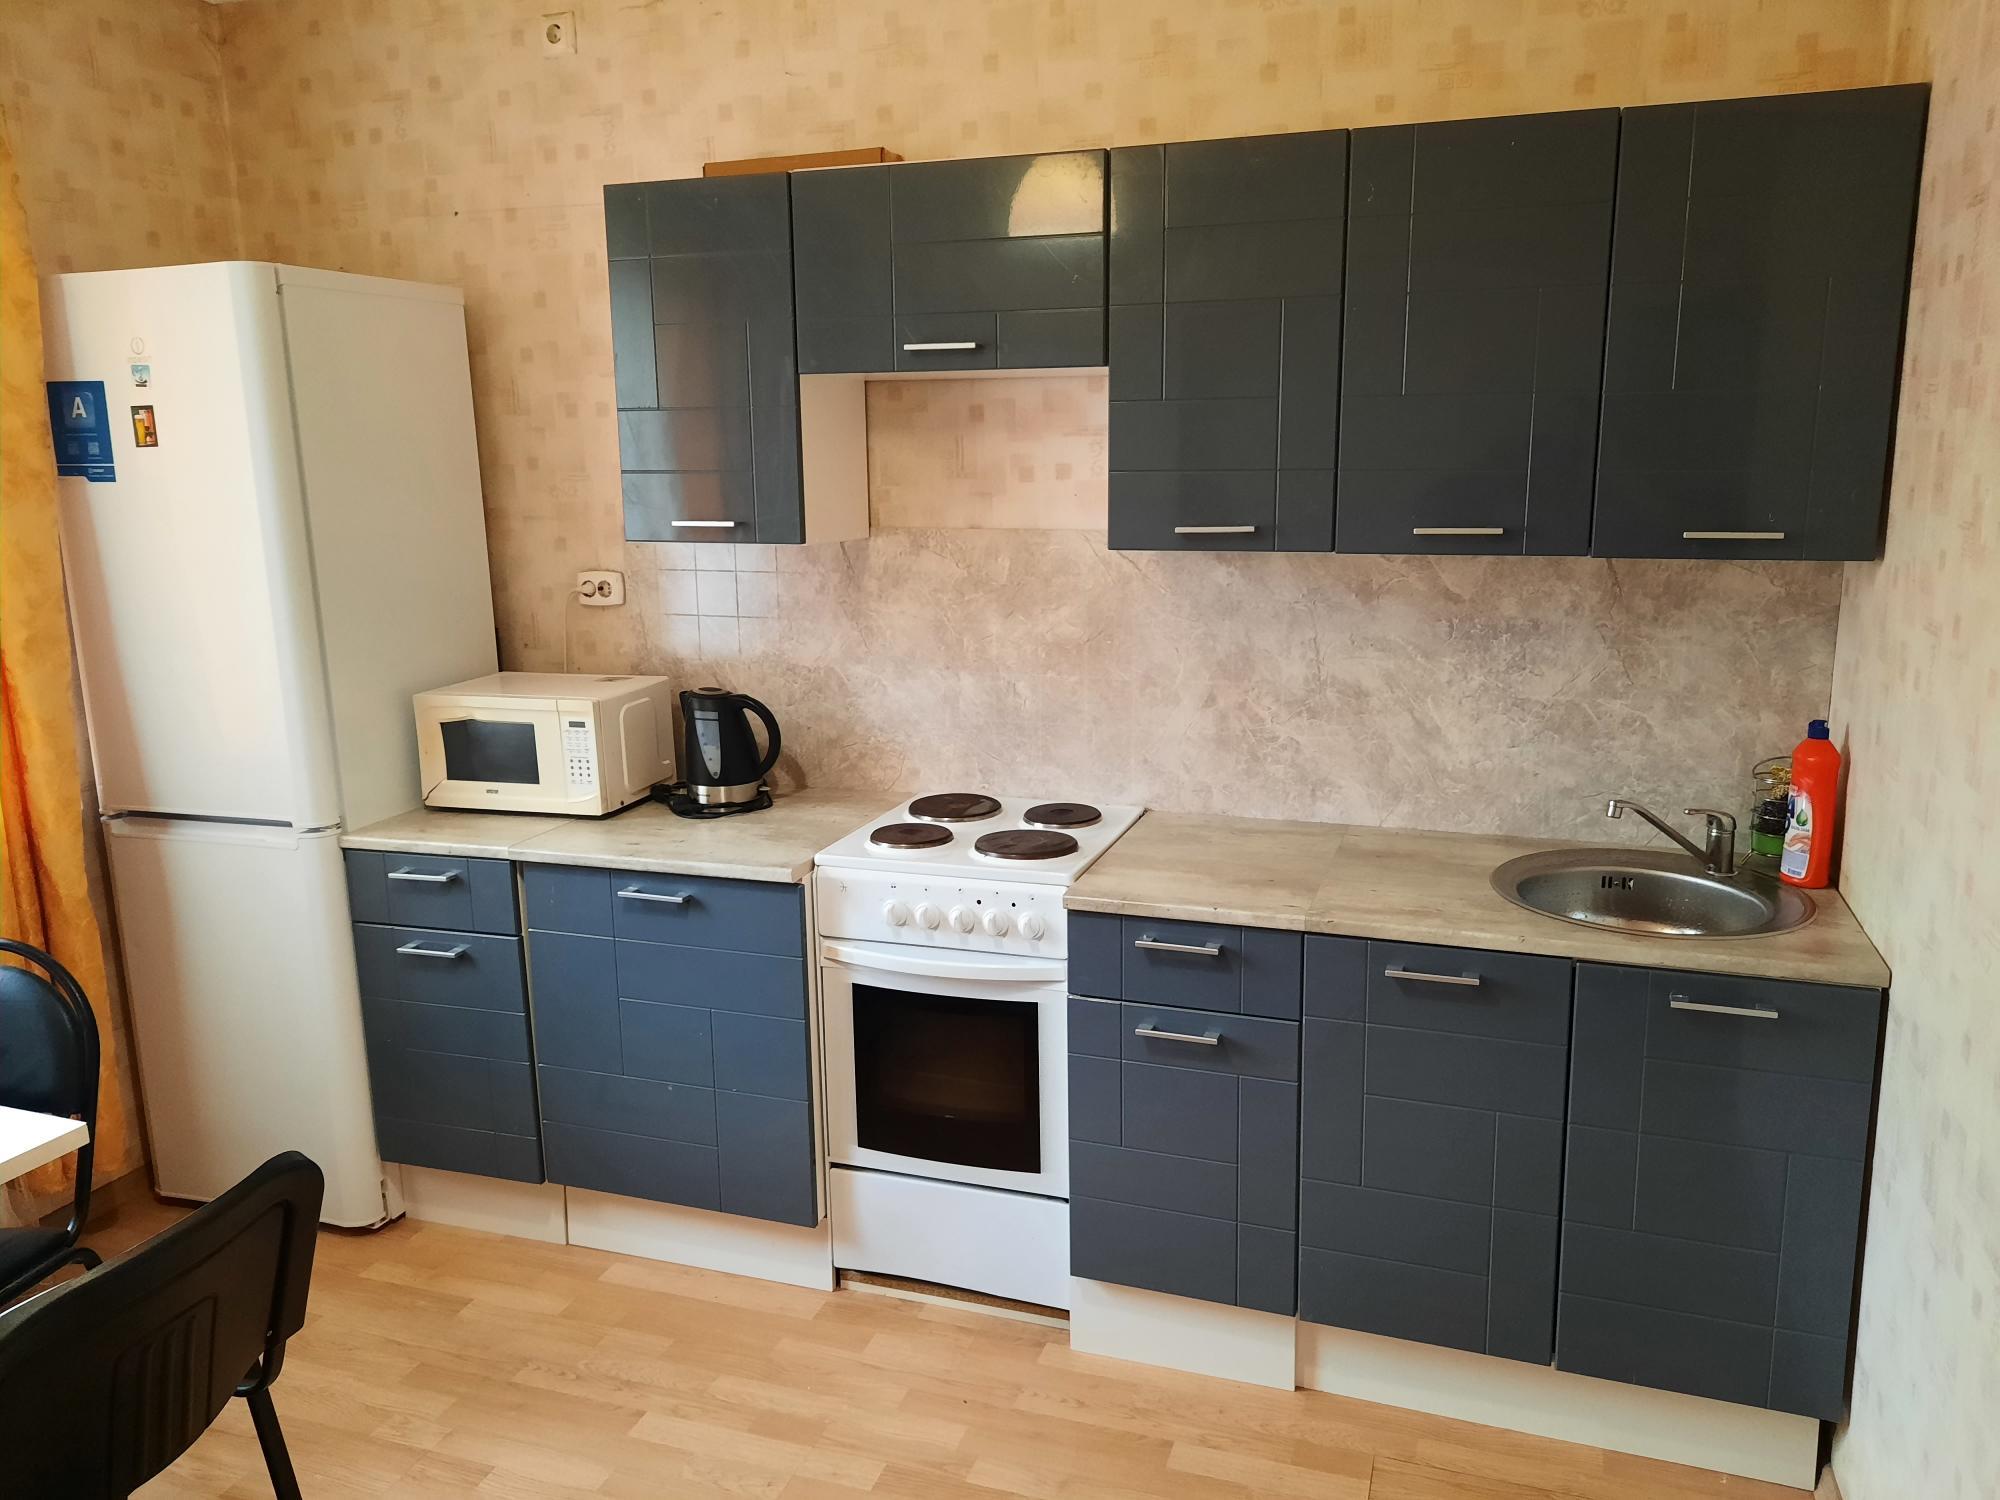 Квартира, 2 комнаты, 61 м² 89269689212 купить 4